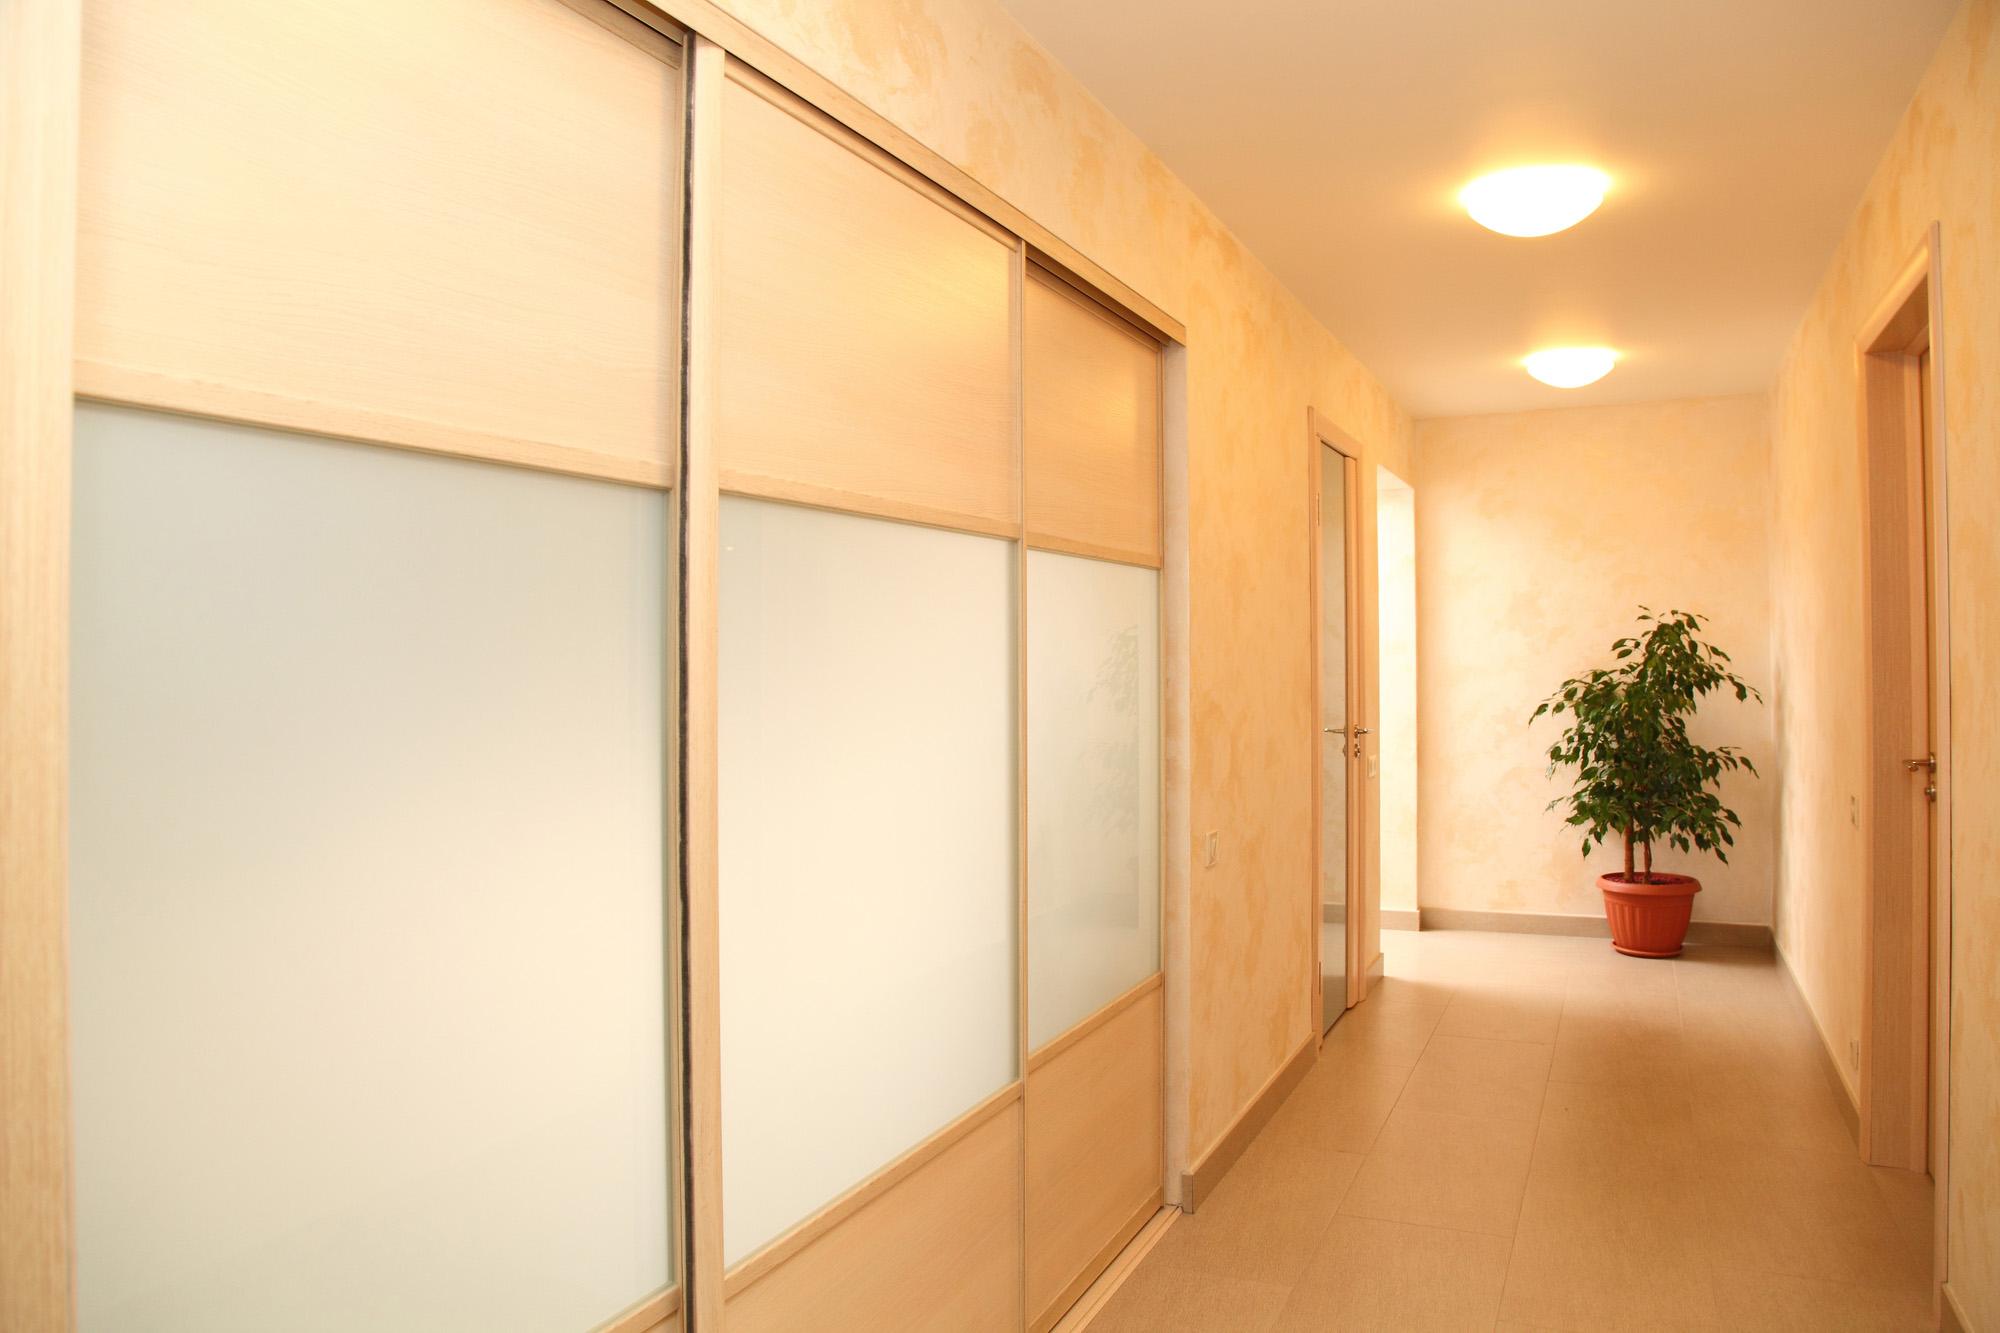 wardrobe with sliding doors, built in wardrobe, bedroom design ideas